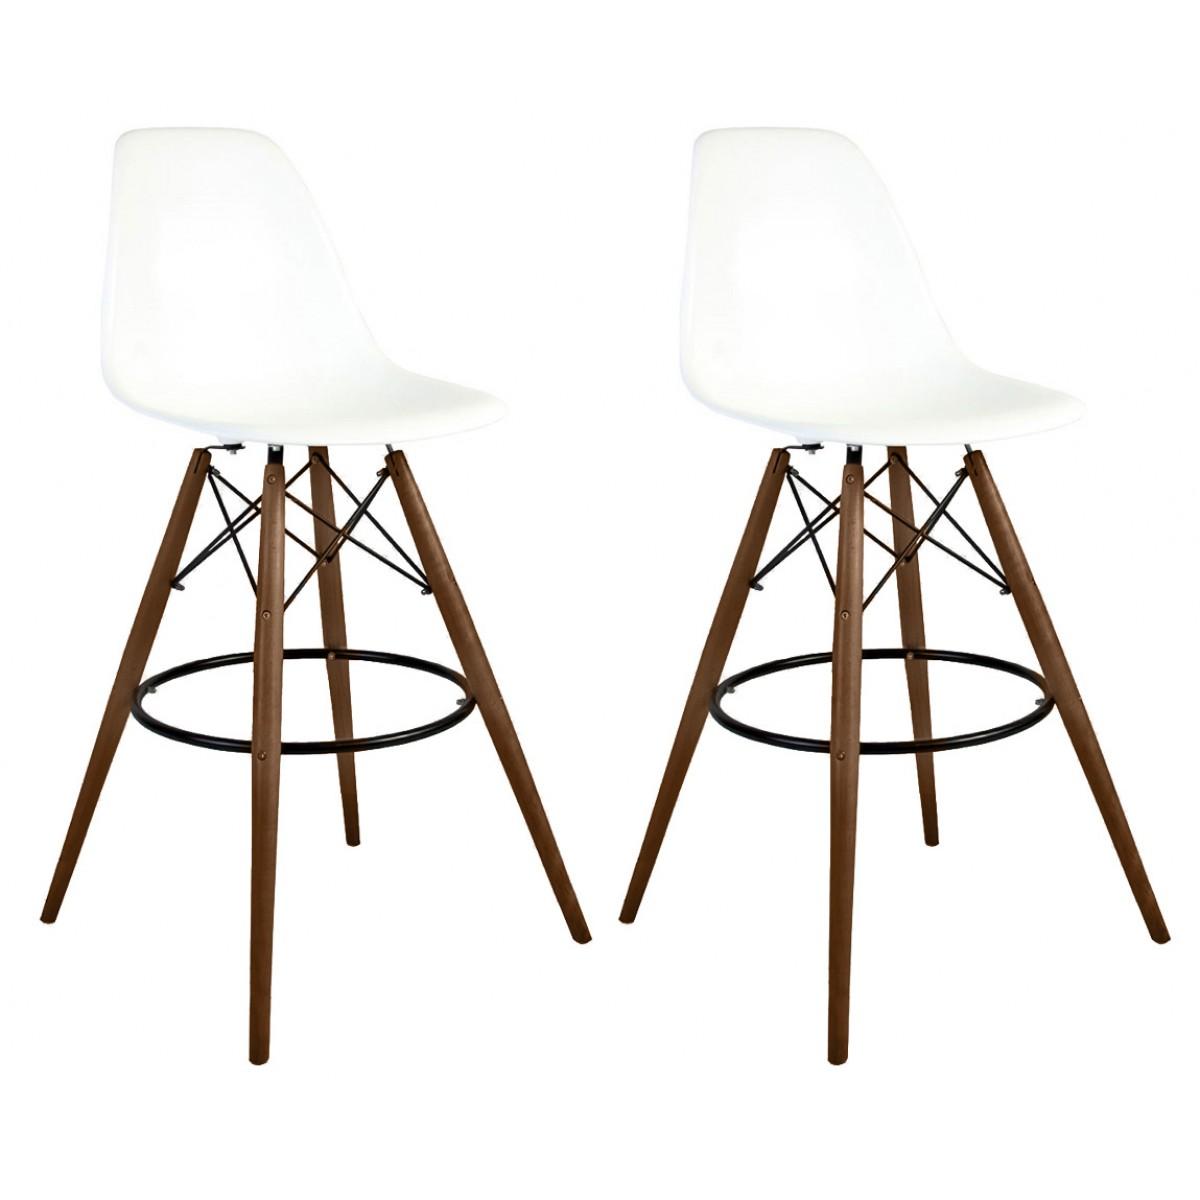 Marvelous Set Of 2 30 Inch Dsw White Plastic Bar Stool With Dark Walnut Eiffel Legs Andrewgaddart Wooden Chair Designs For Living Room Andrewgaddartcom